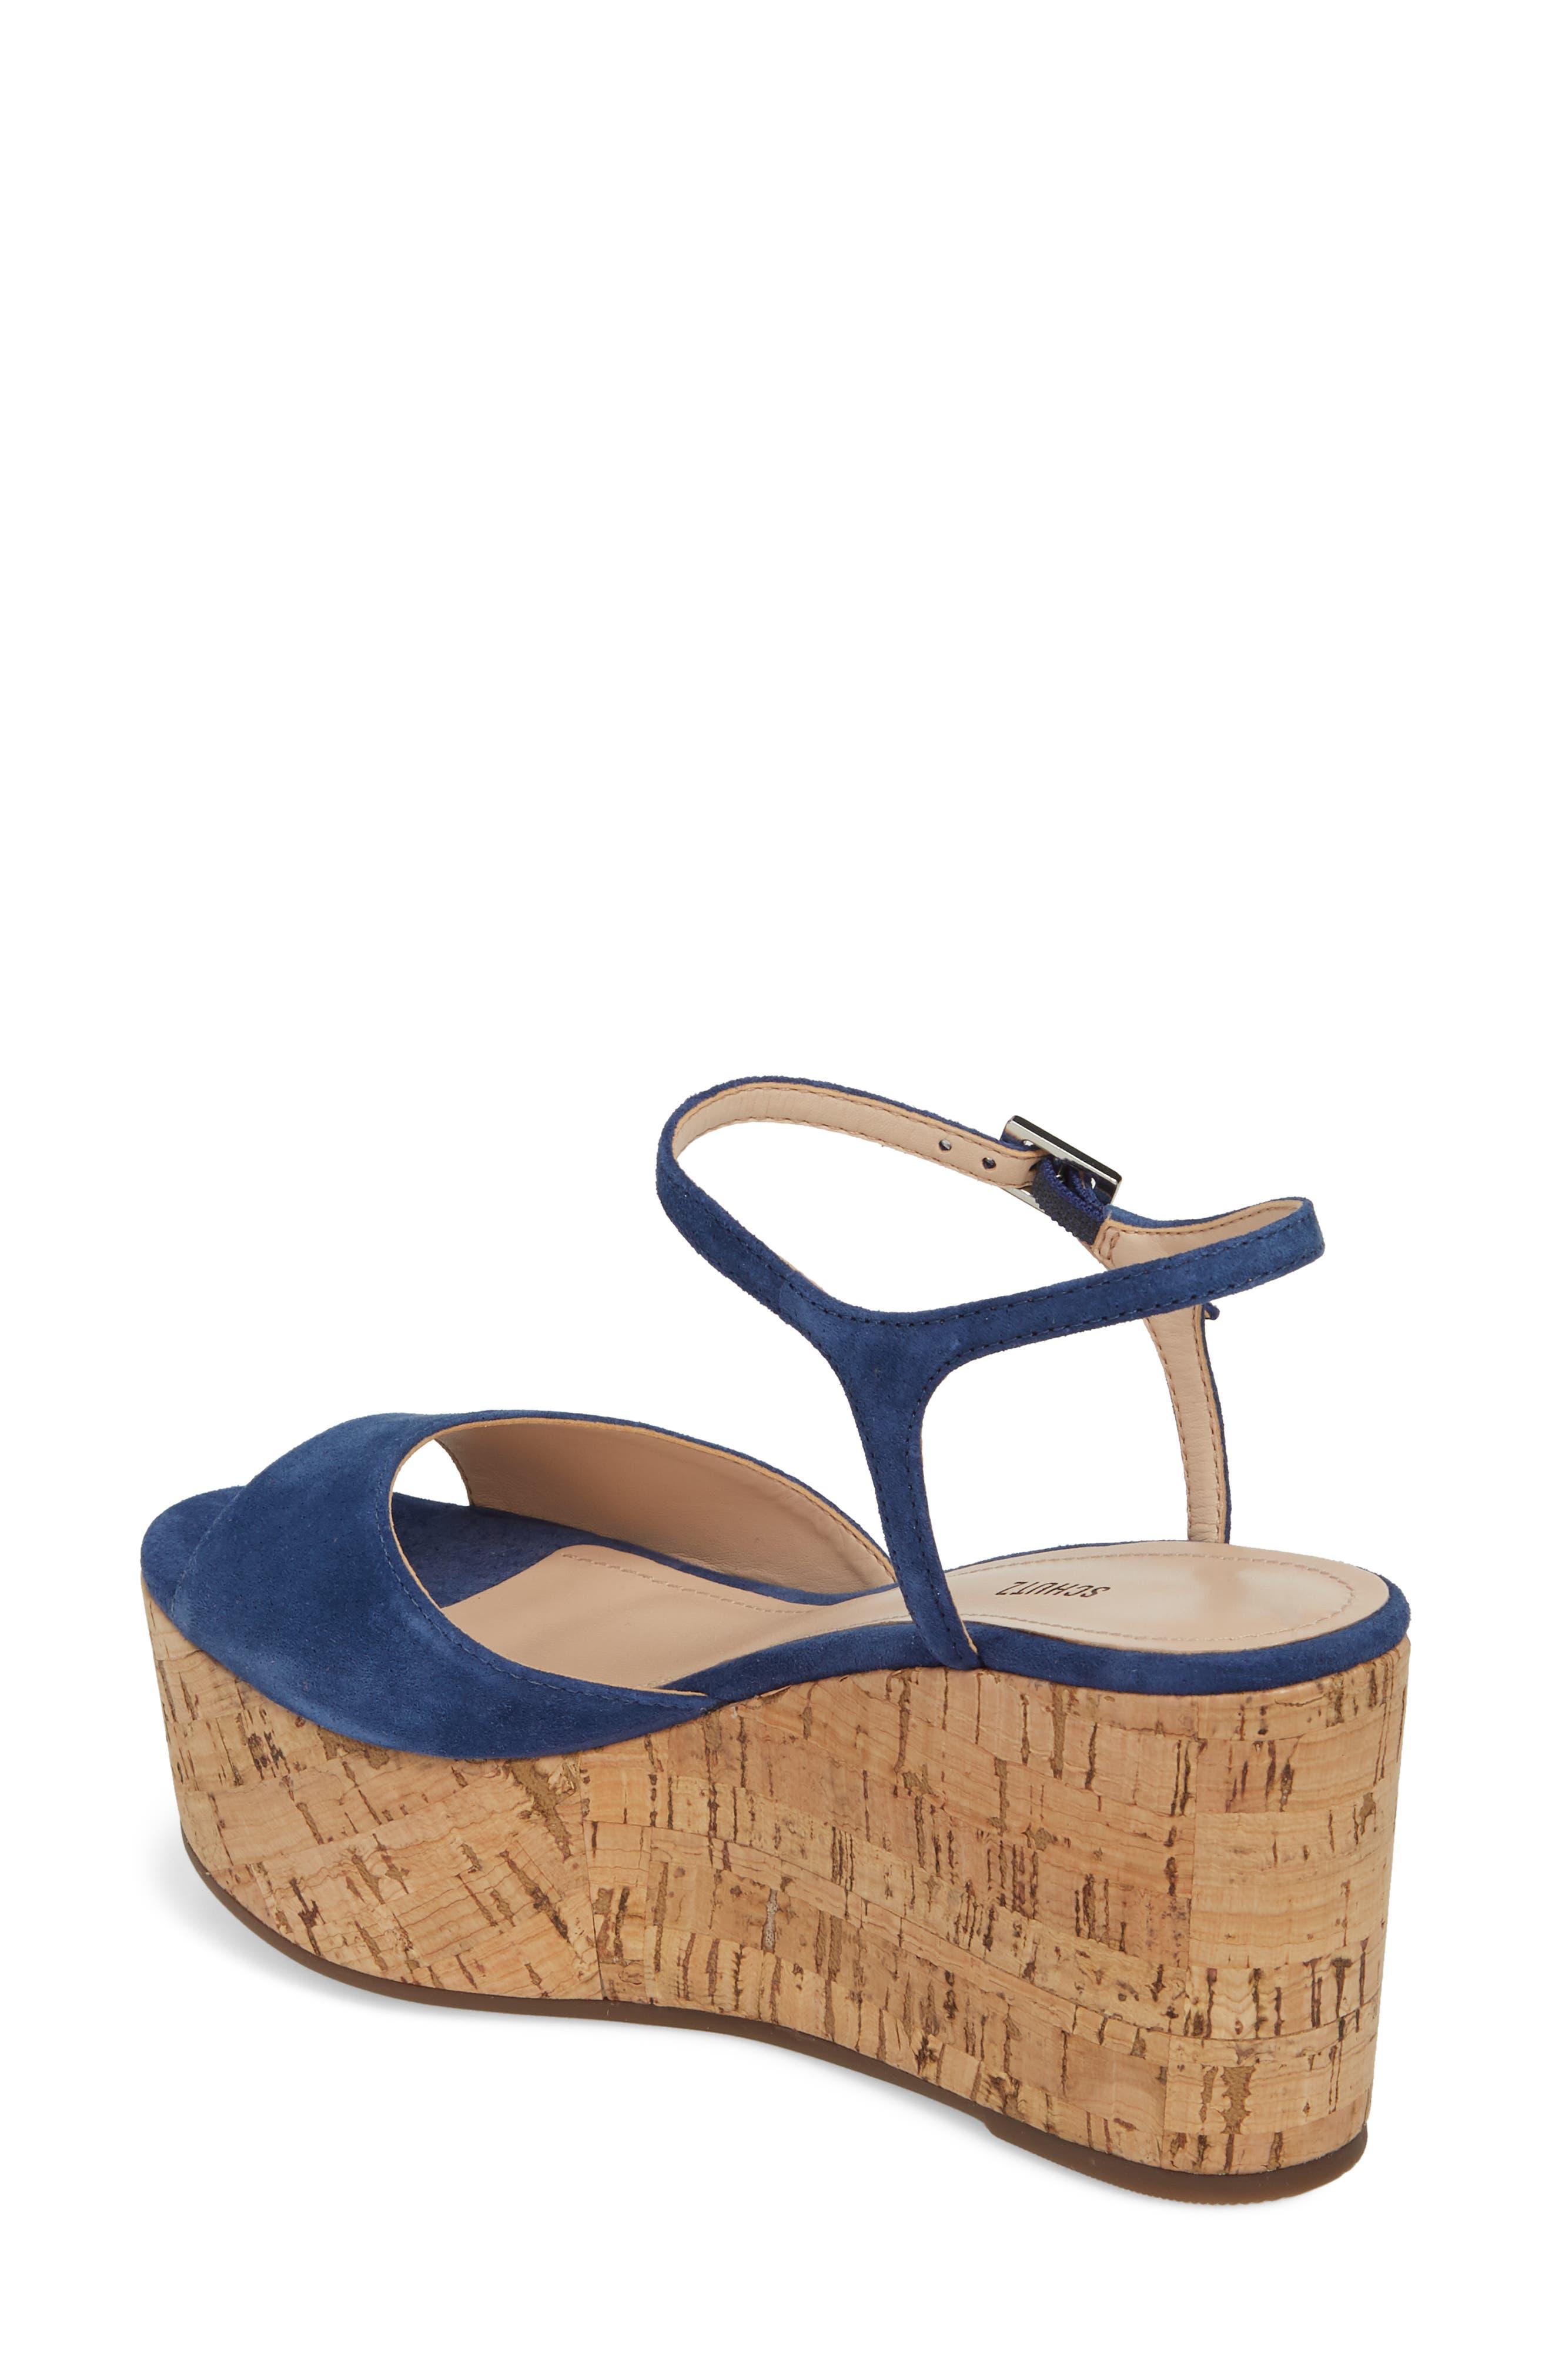 Heloise Platform Wedge Sandal,                             Alternate thumbnail 2, color,                             Dress Blue